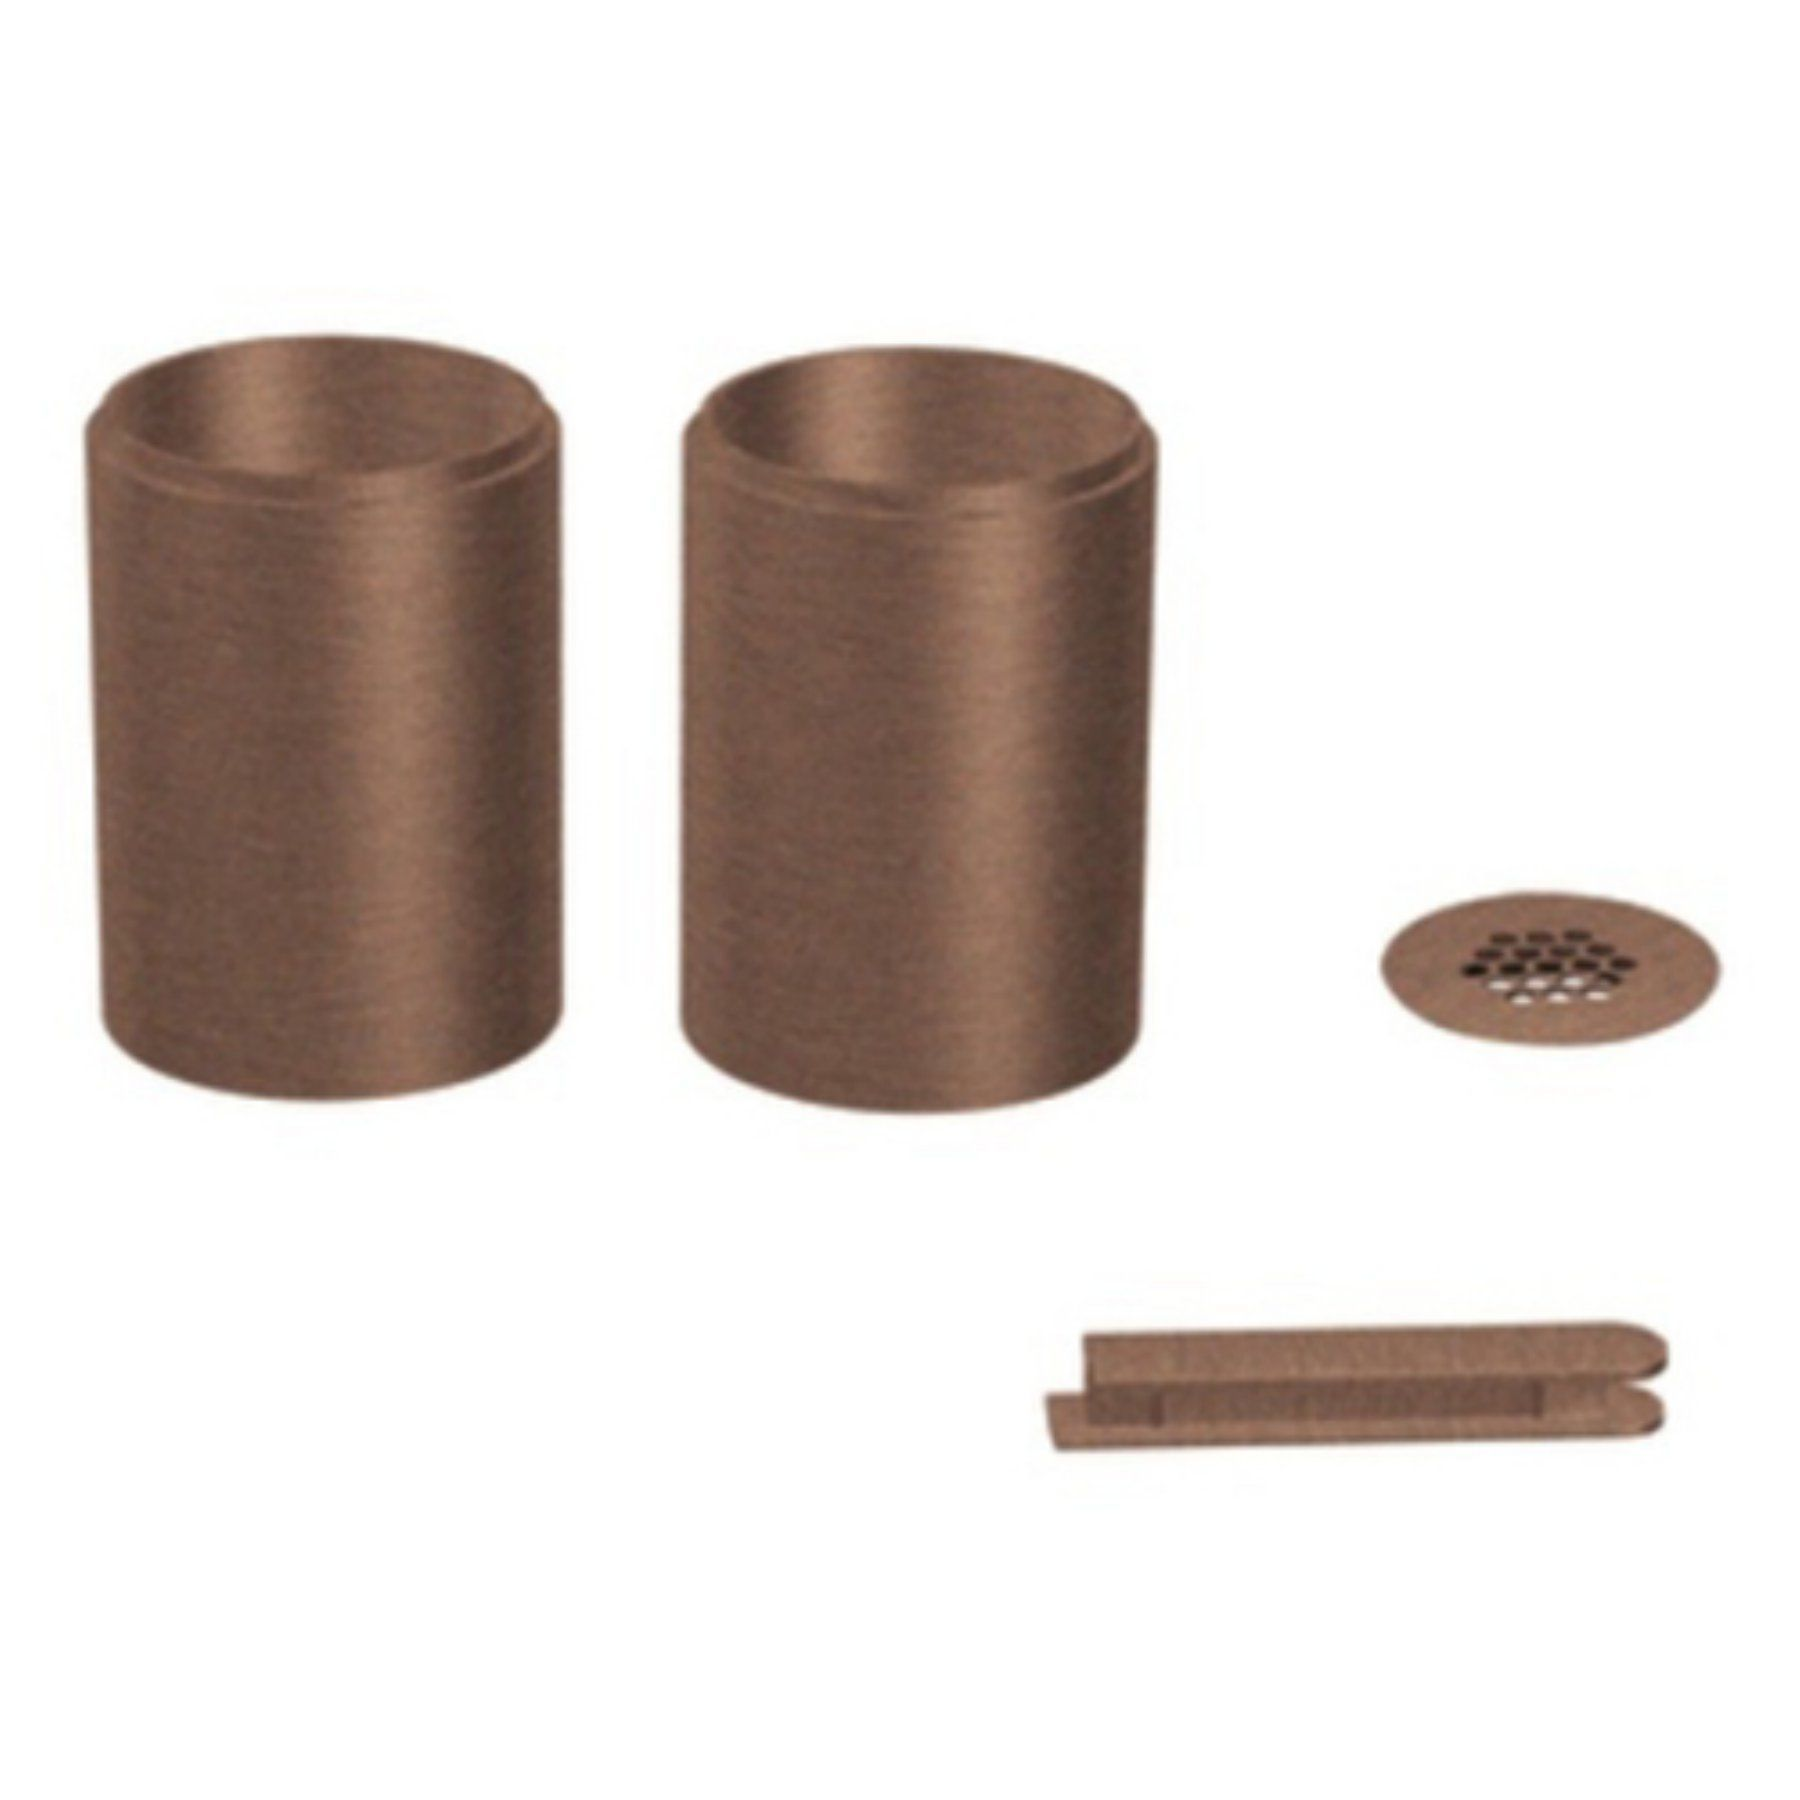 Moen Icon Oil Rubbed Bronze Extension Kits Oil Rubbed Bronze